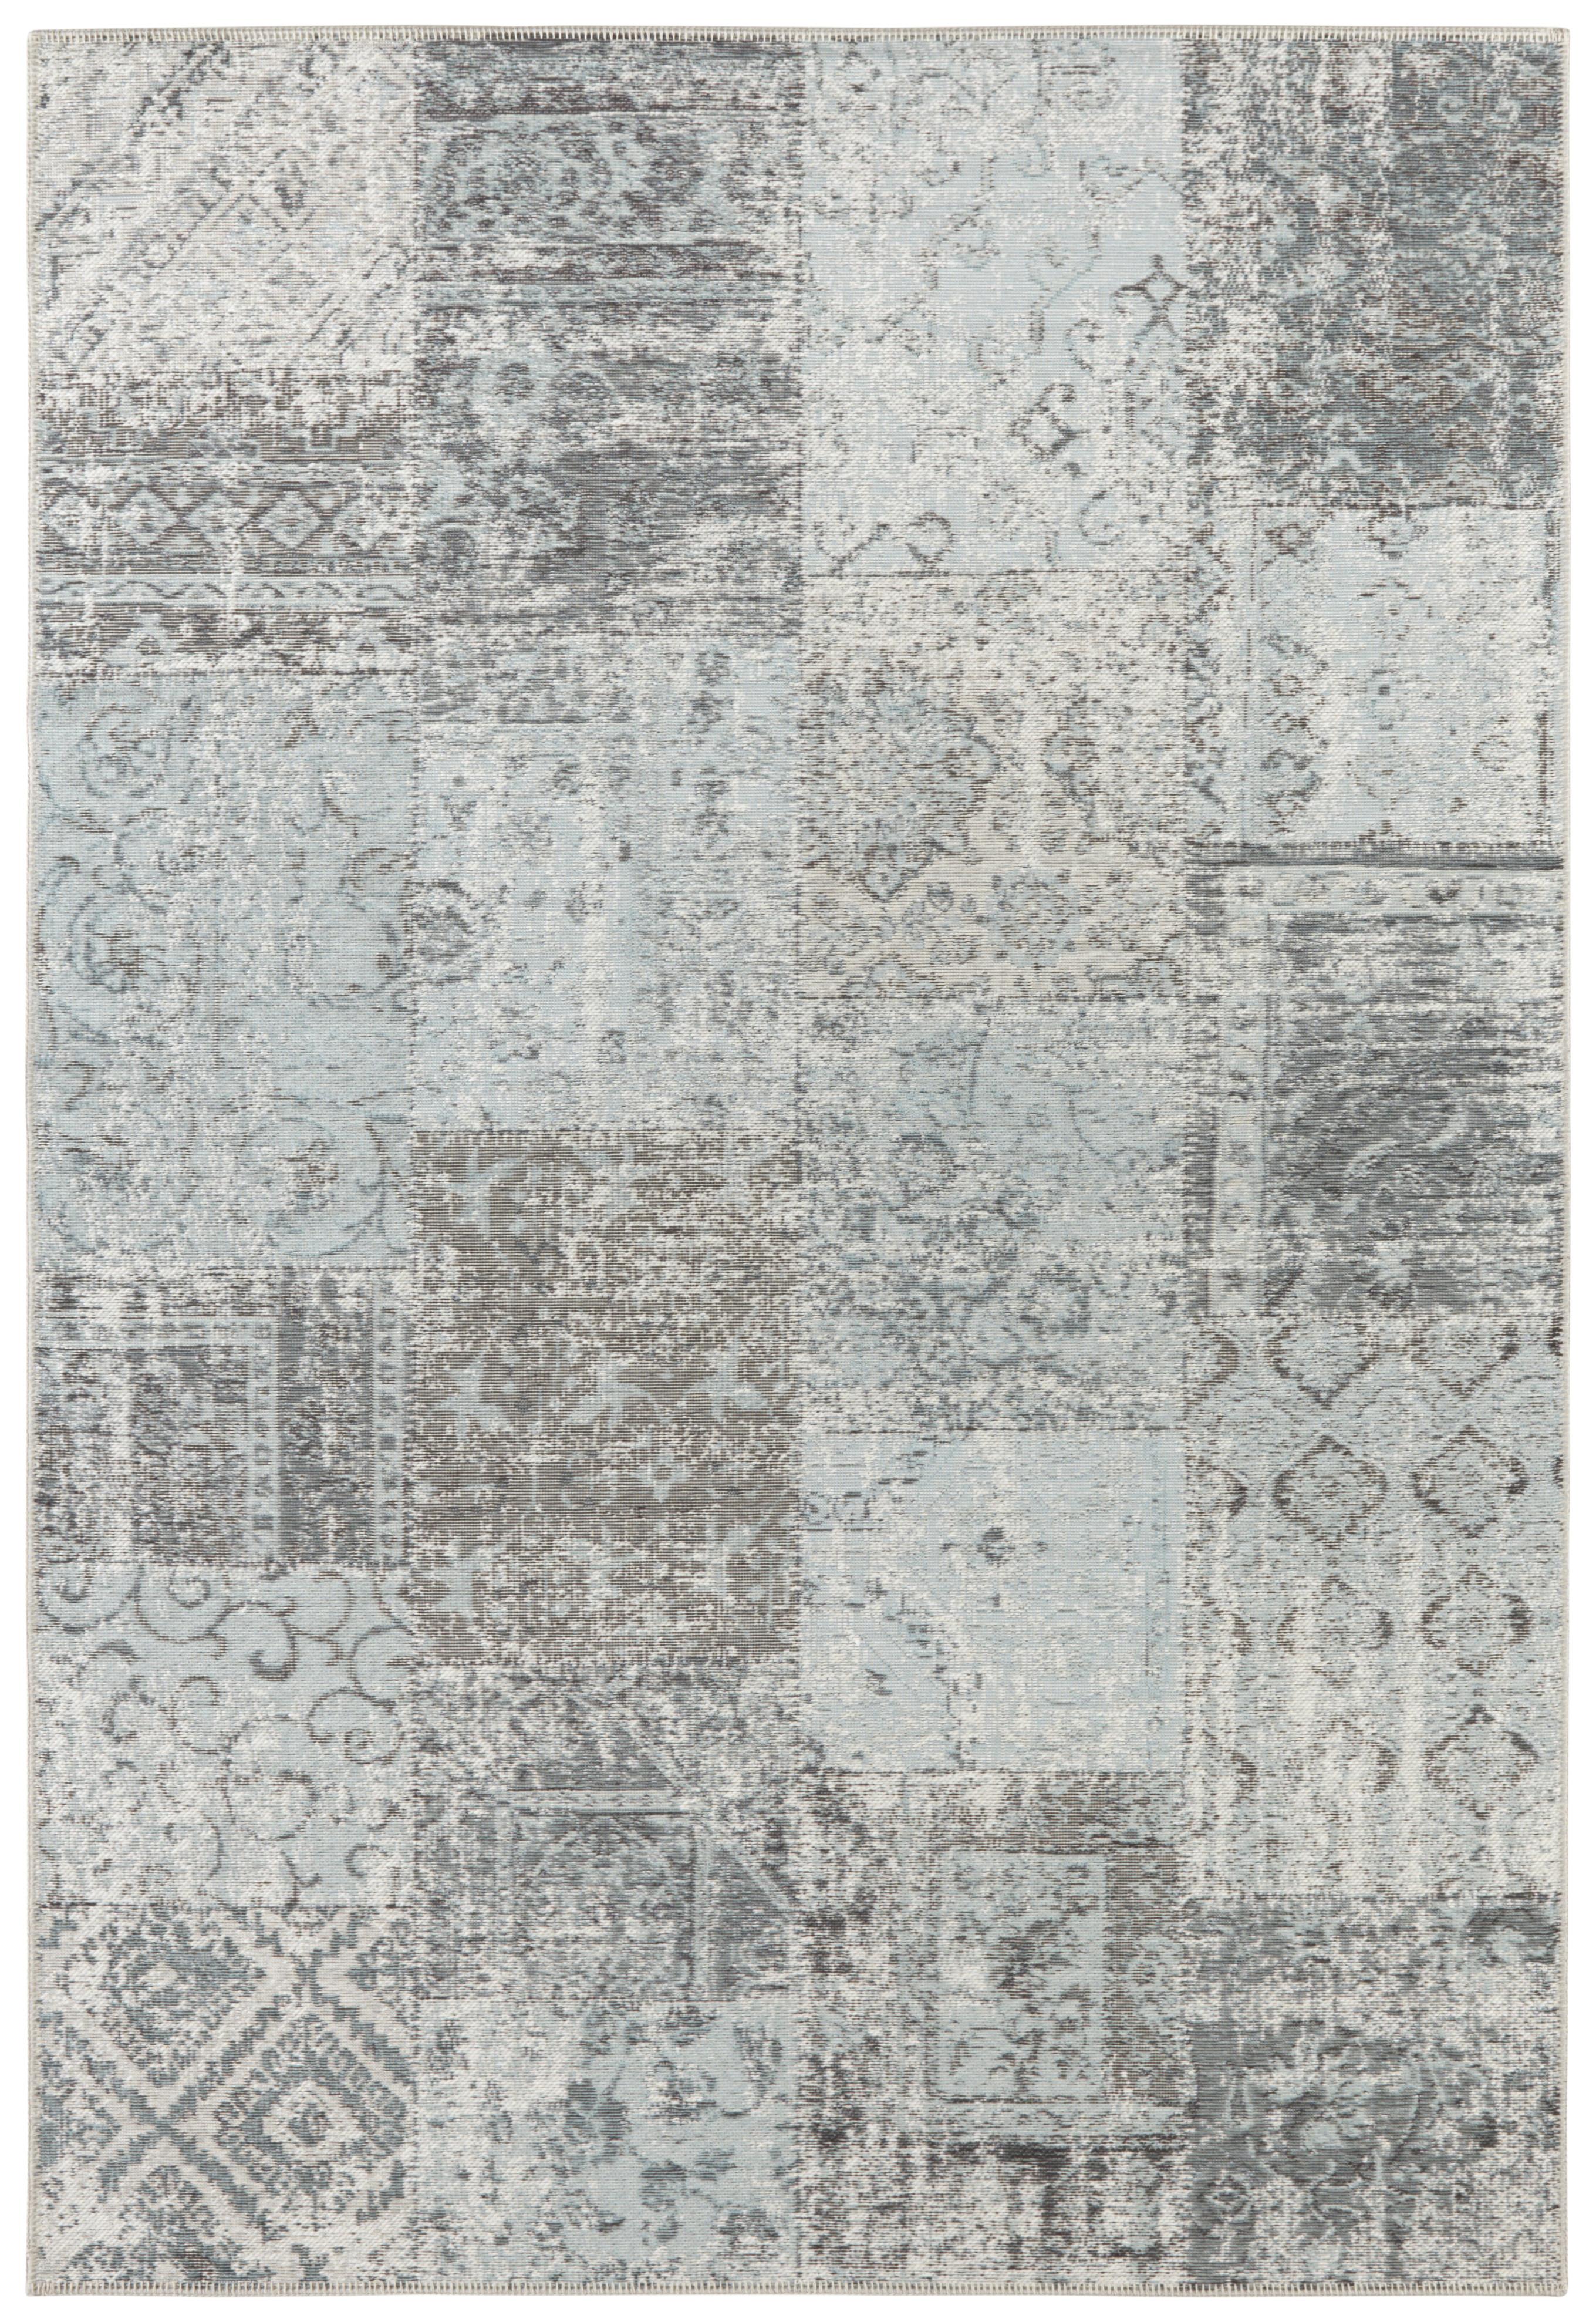 Levně ELLE Decor koberce Kusový koberec Pleasure 103587 Light Blue/Black/Cream z kolekce Elle - 120x170 cm Modrá